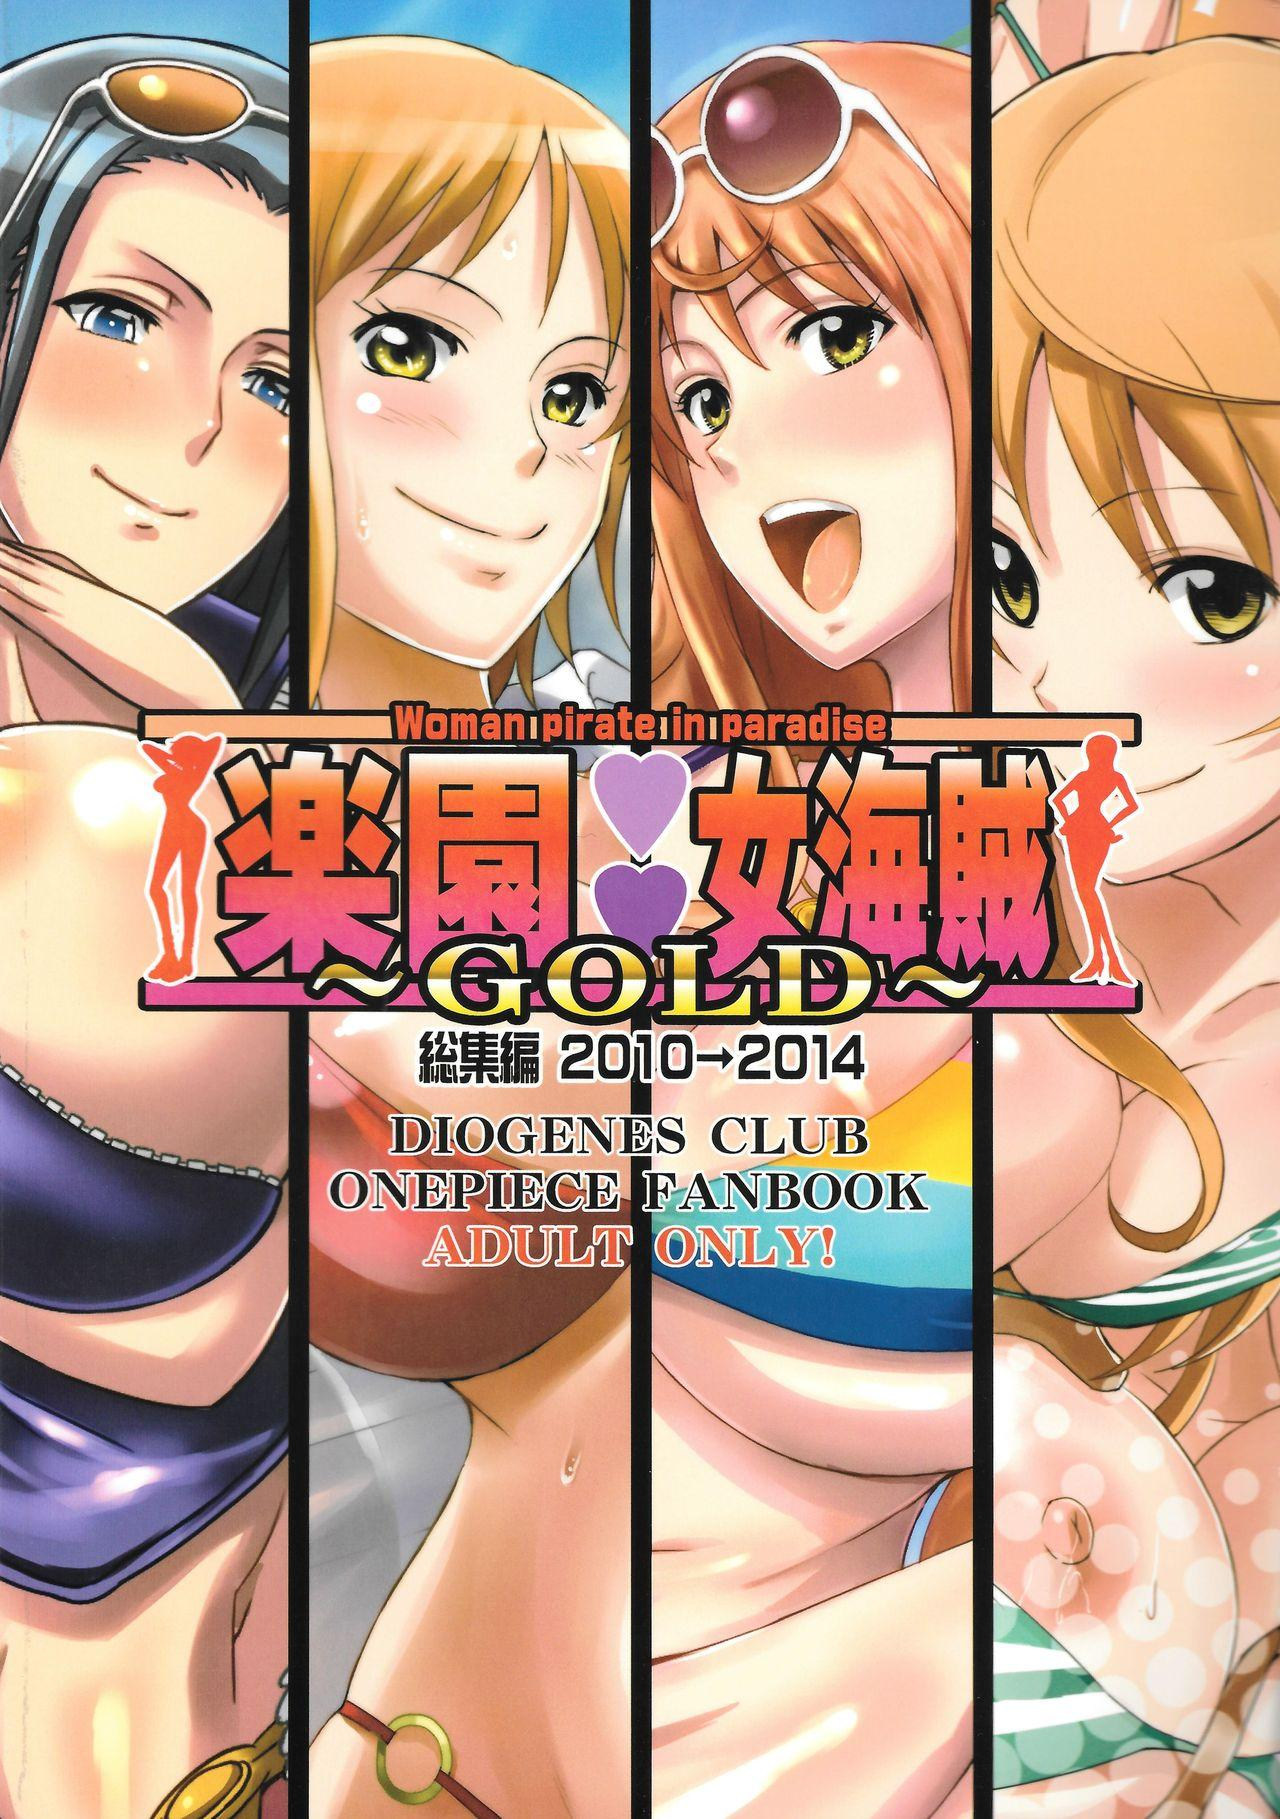 (C87) [Diogenes Club (Haikawa Hemlen)] Rakuen Onna Kaizoku Soushuuhen ~GOLD~ - Woman Pirate in Paradise (One Piece) [English] {doujin-moe.us} [Incomplete] 14